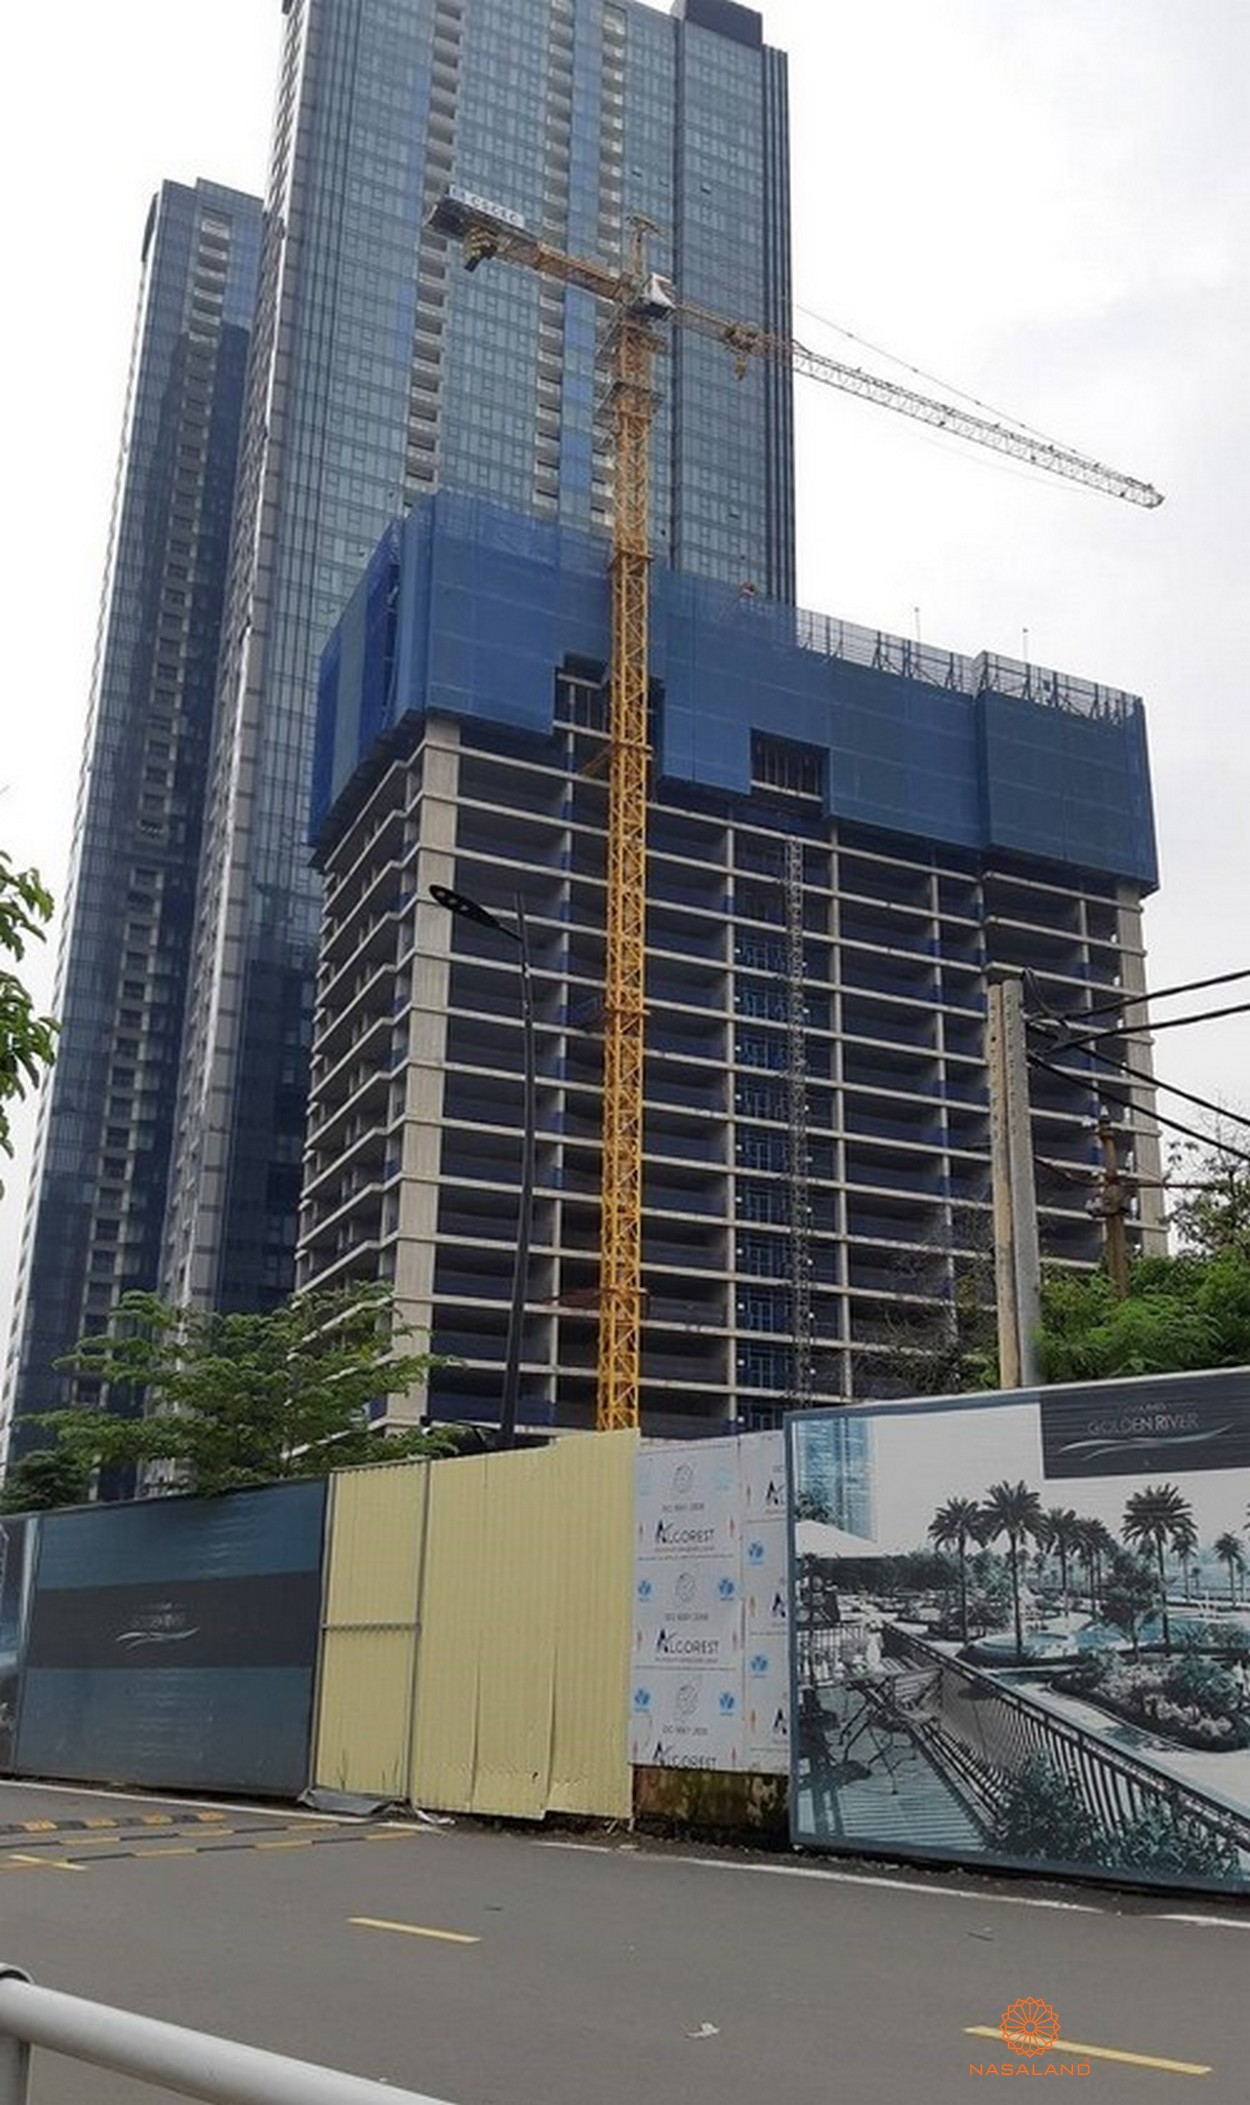 Tiến độ dự án căn hộ cao cấp Centennial